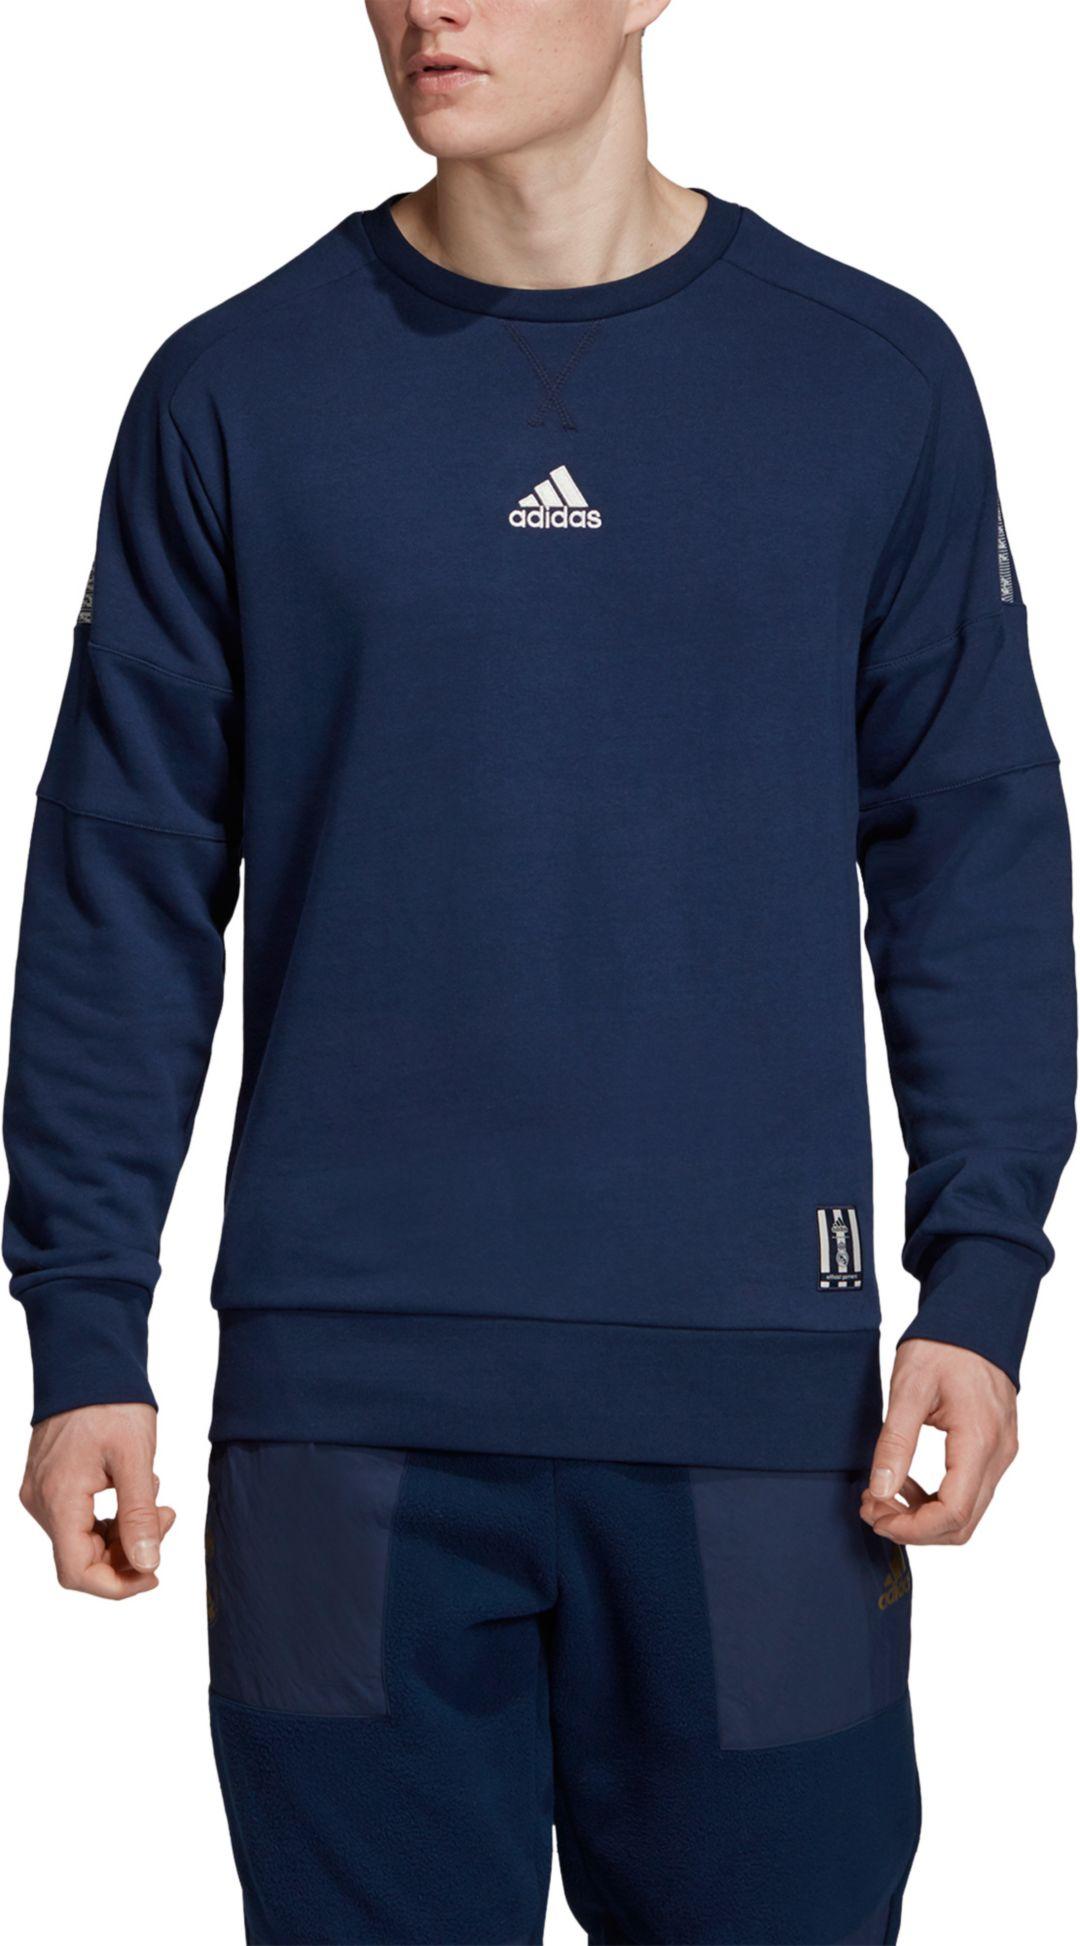 Madrid Real Sweatshirt Men's Navy Crew Adidas Neck Ssp 4Rj5L3A